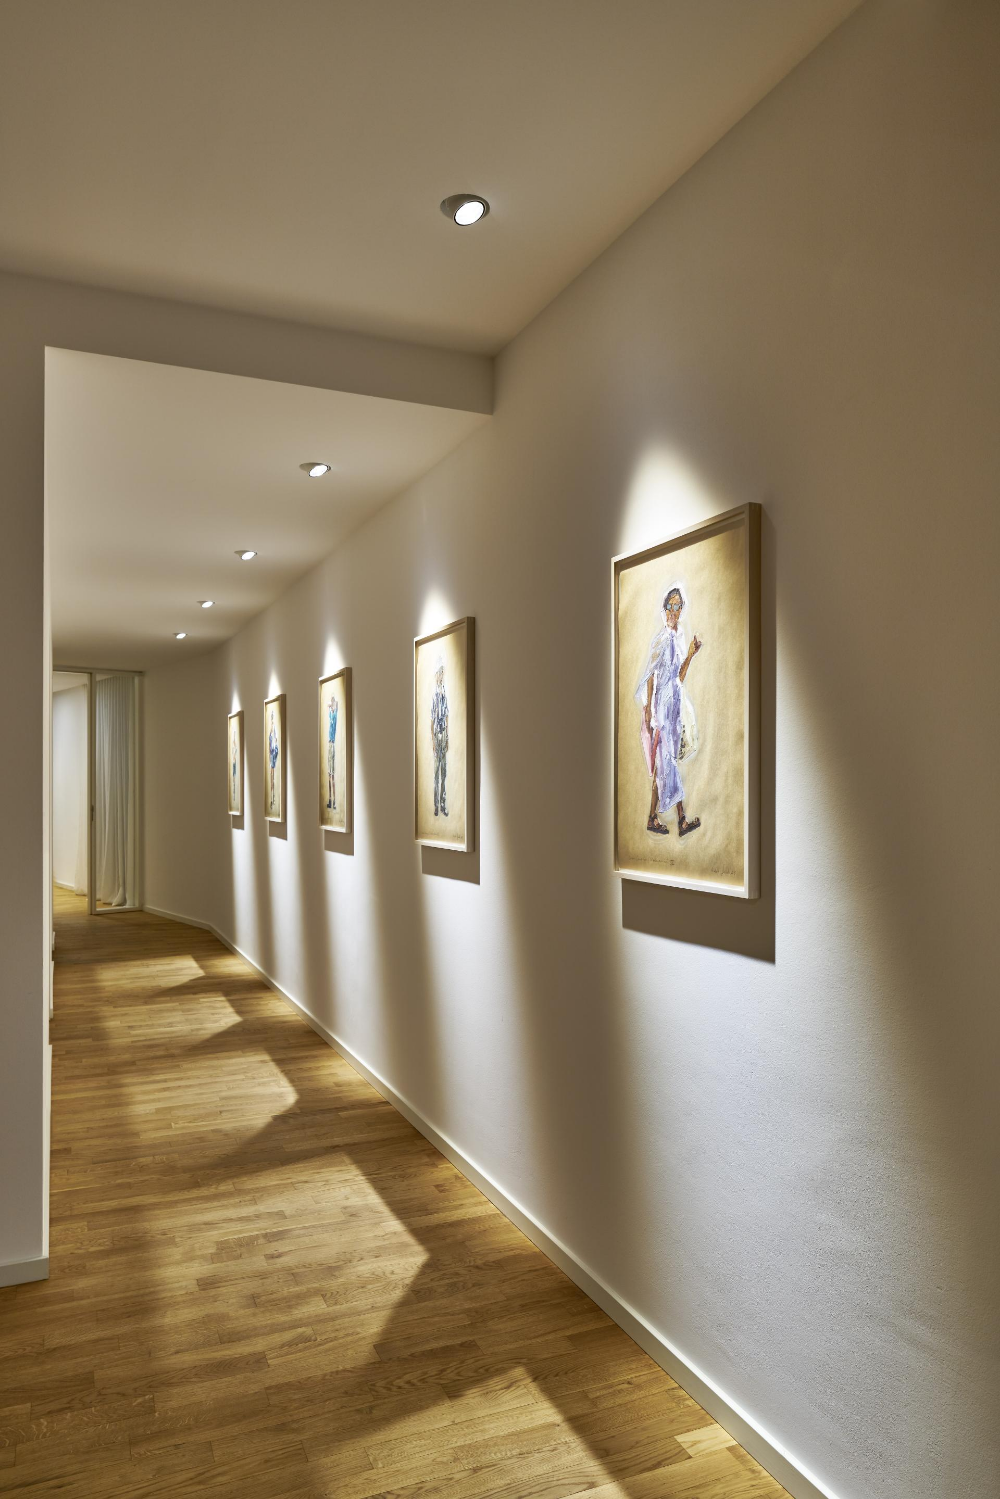 Lui Piano Home Lighting Design Ceiling Spotlights Recessed Lighting Living Room